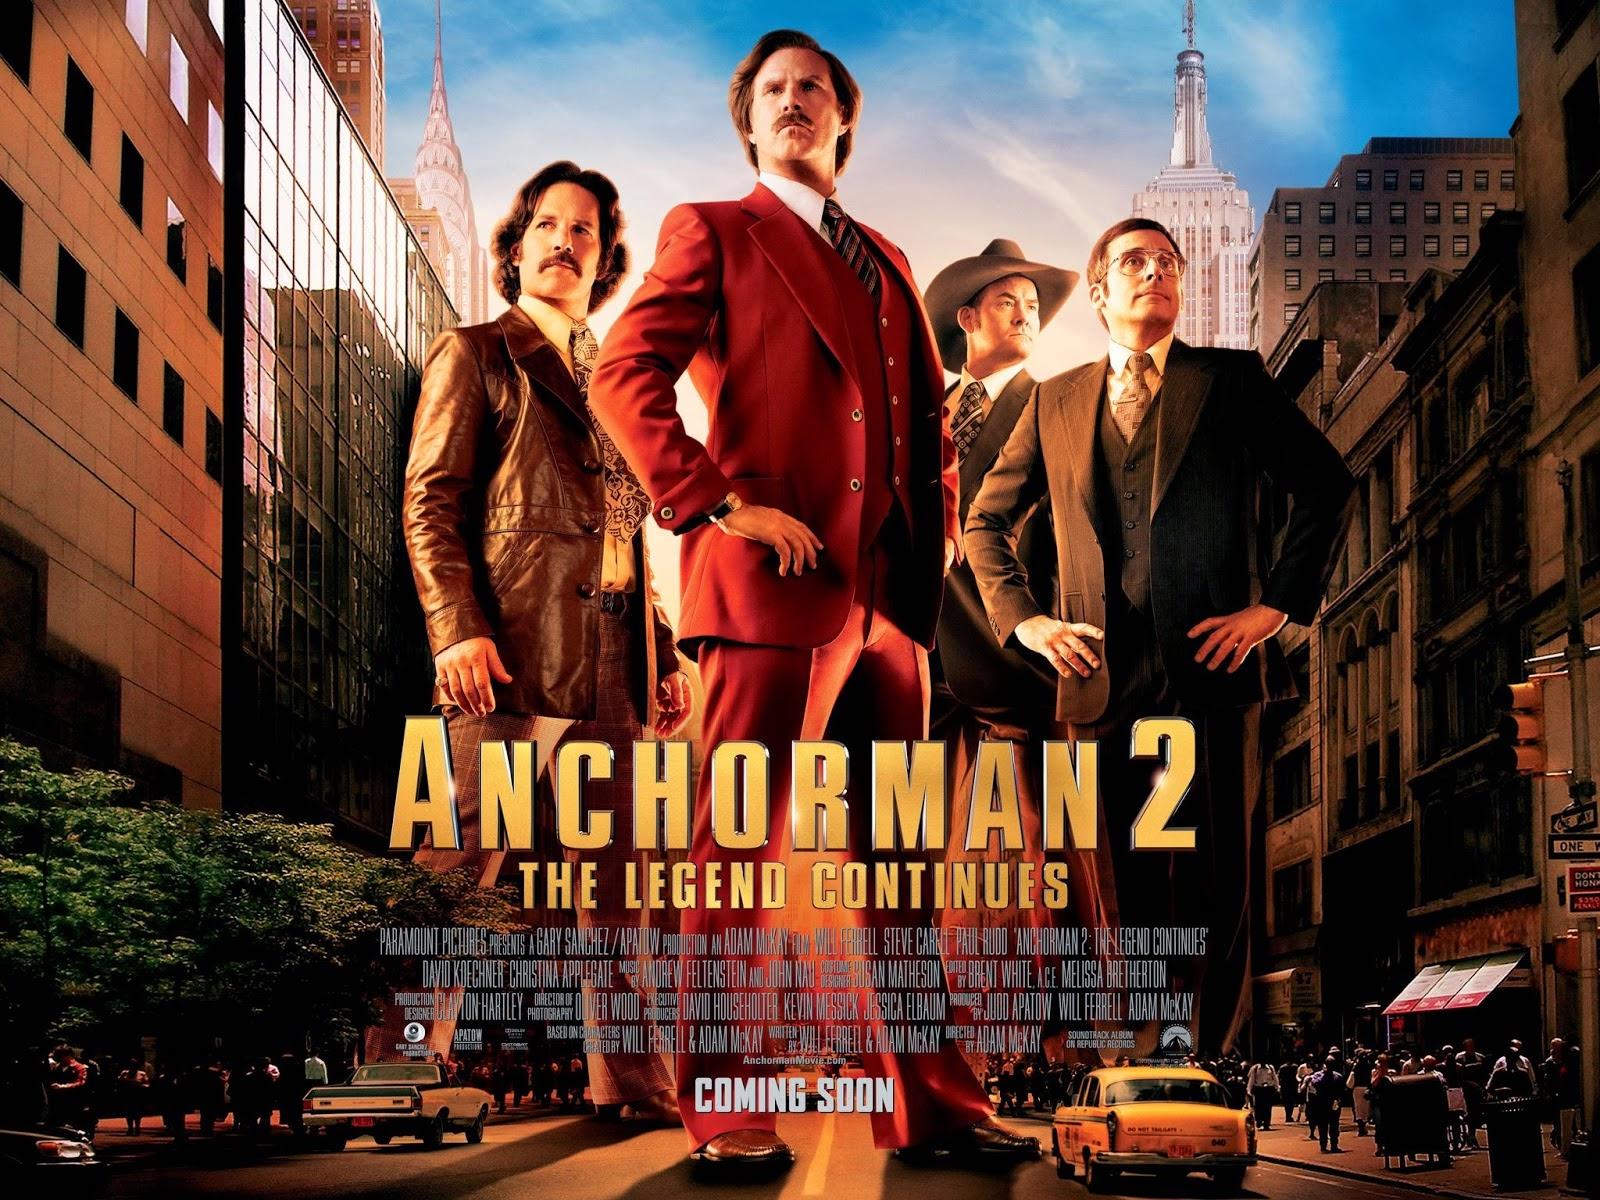 Download Anchorman 2: The Legend Continues (2013) 720p